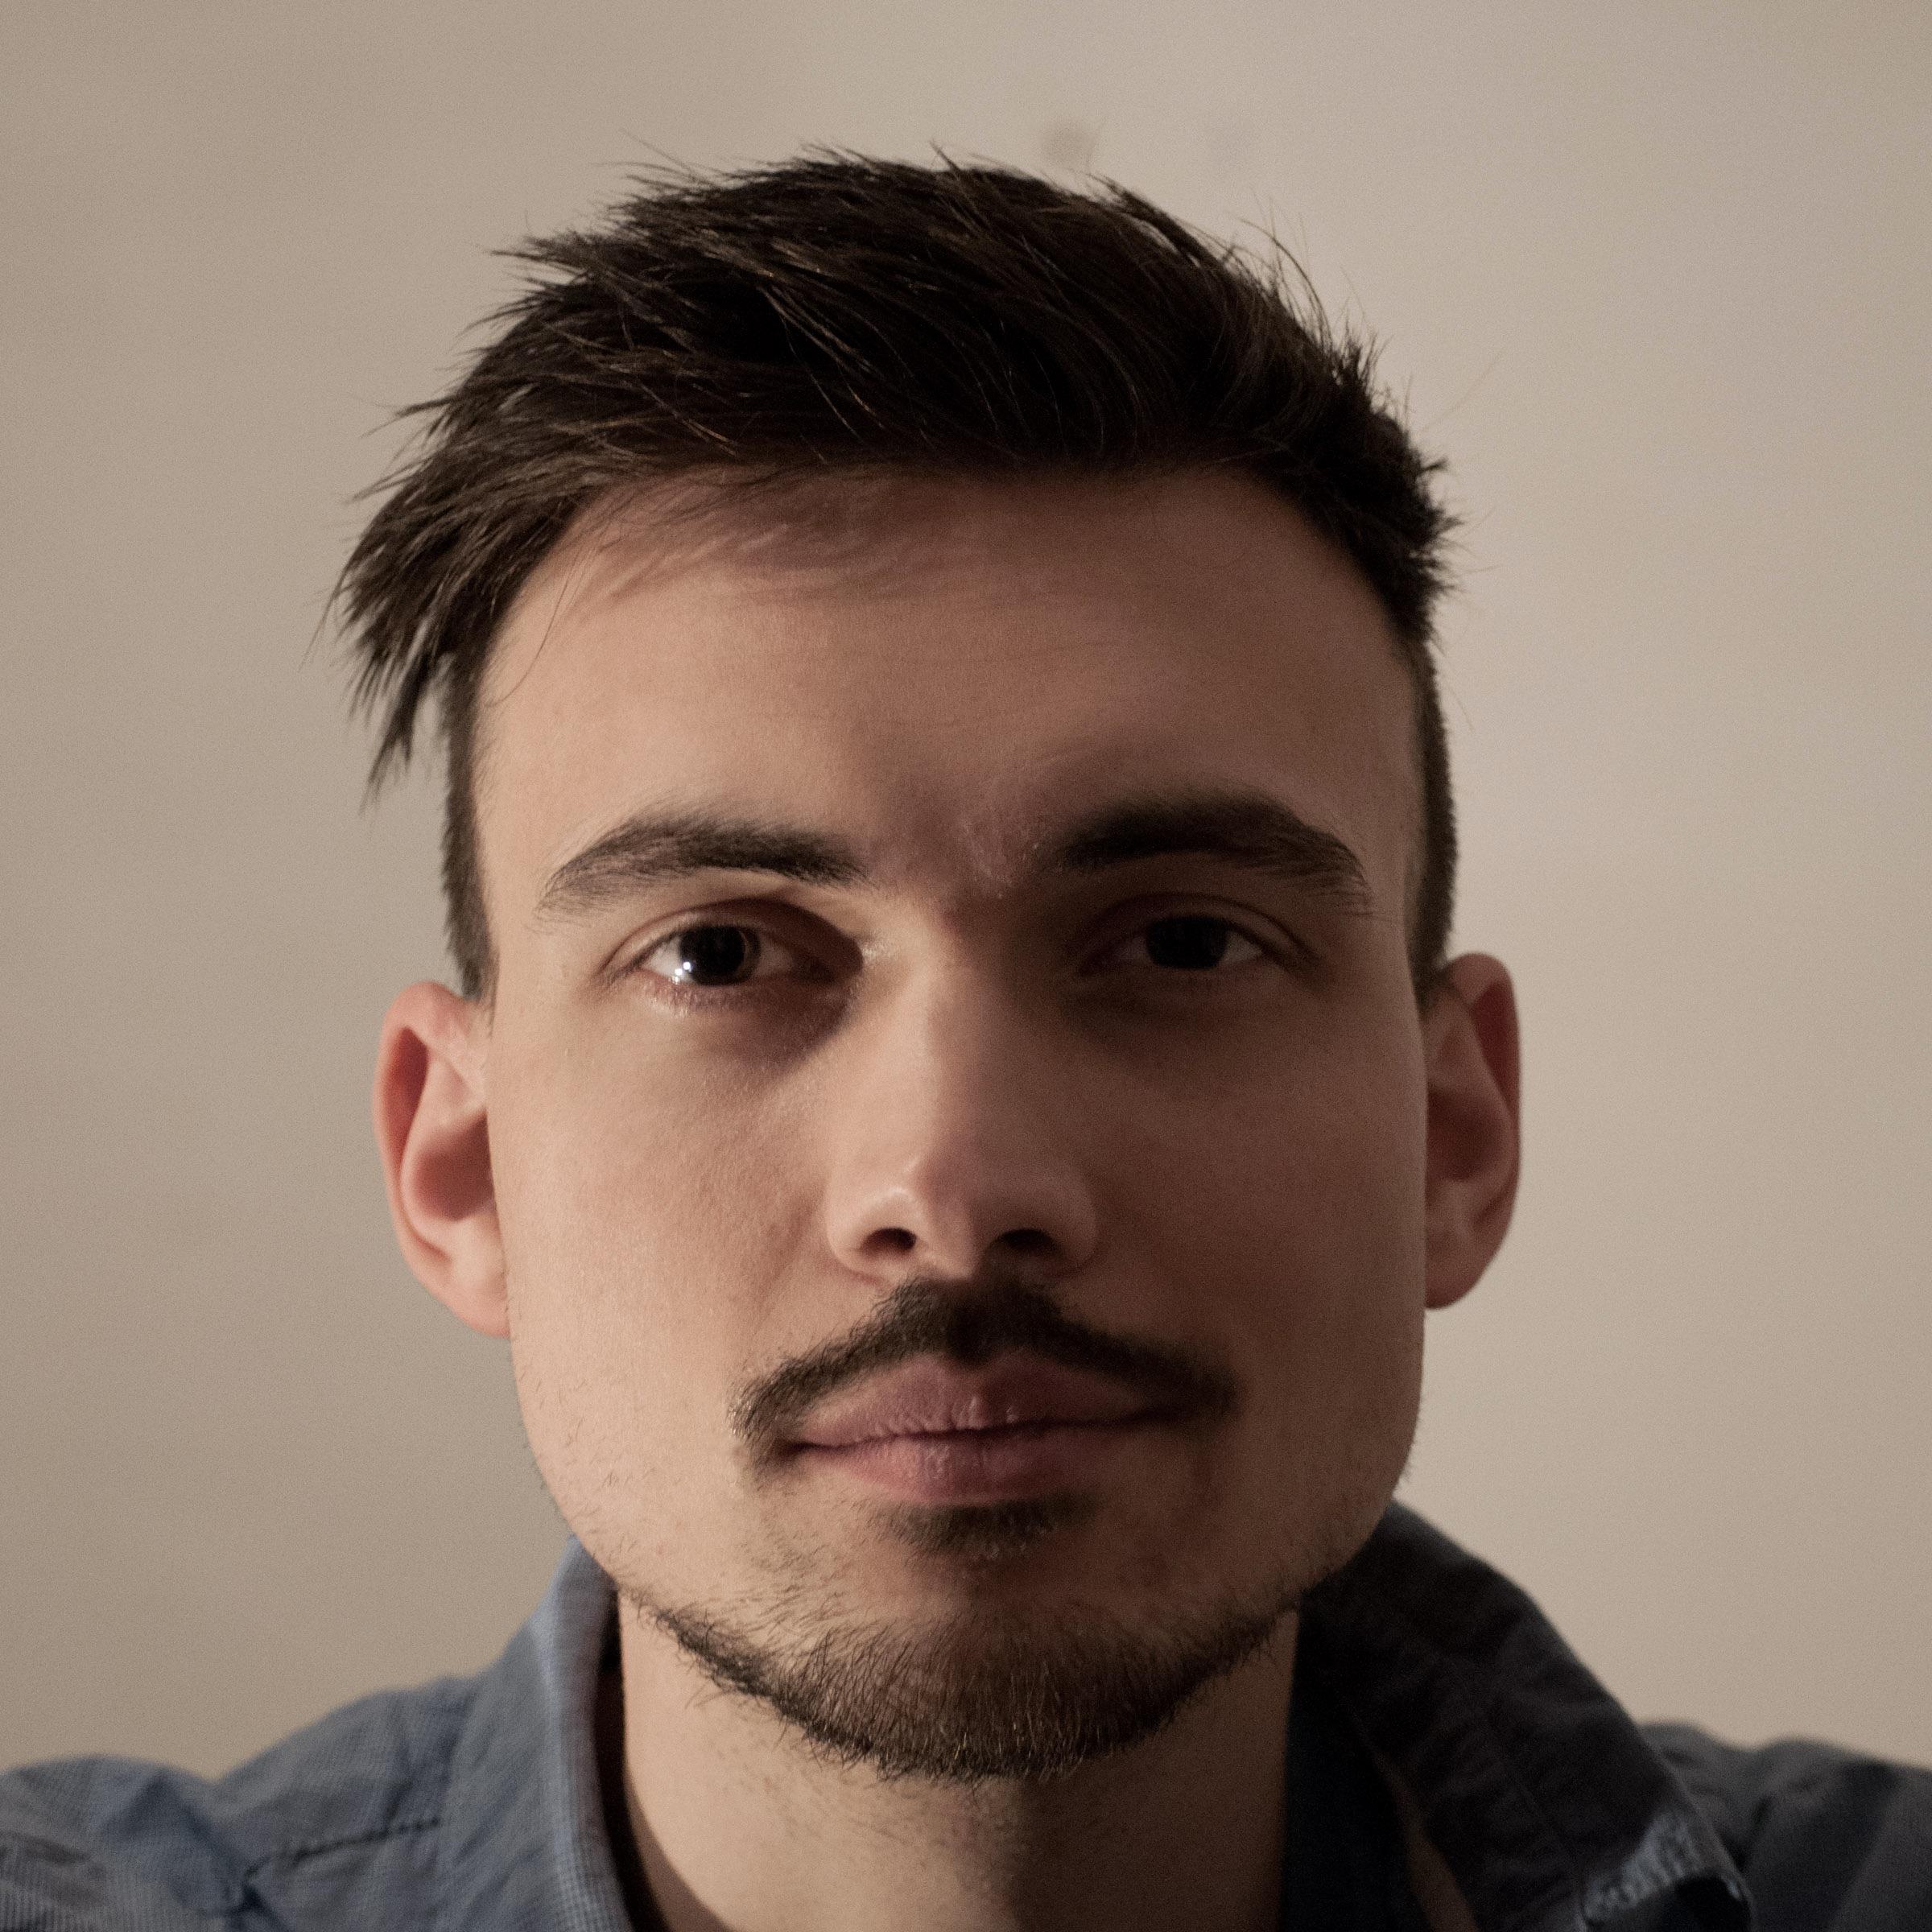 pandy_director